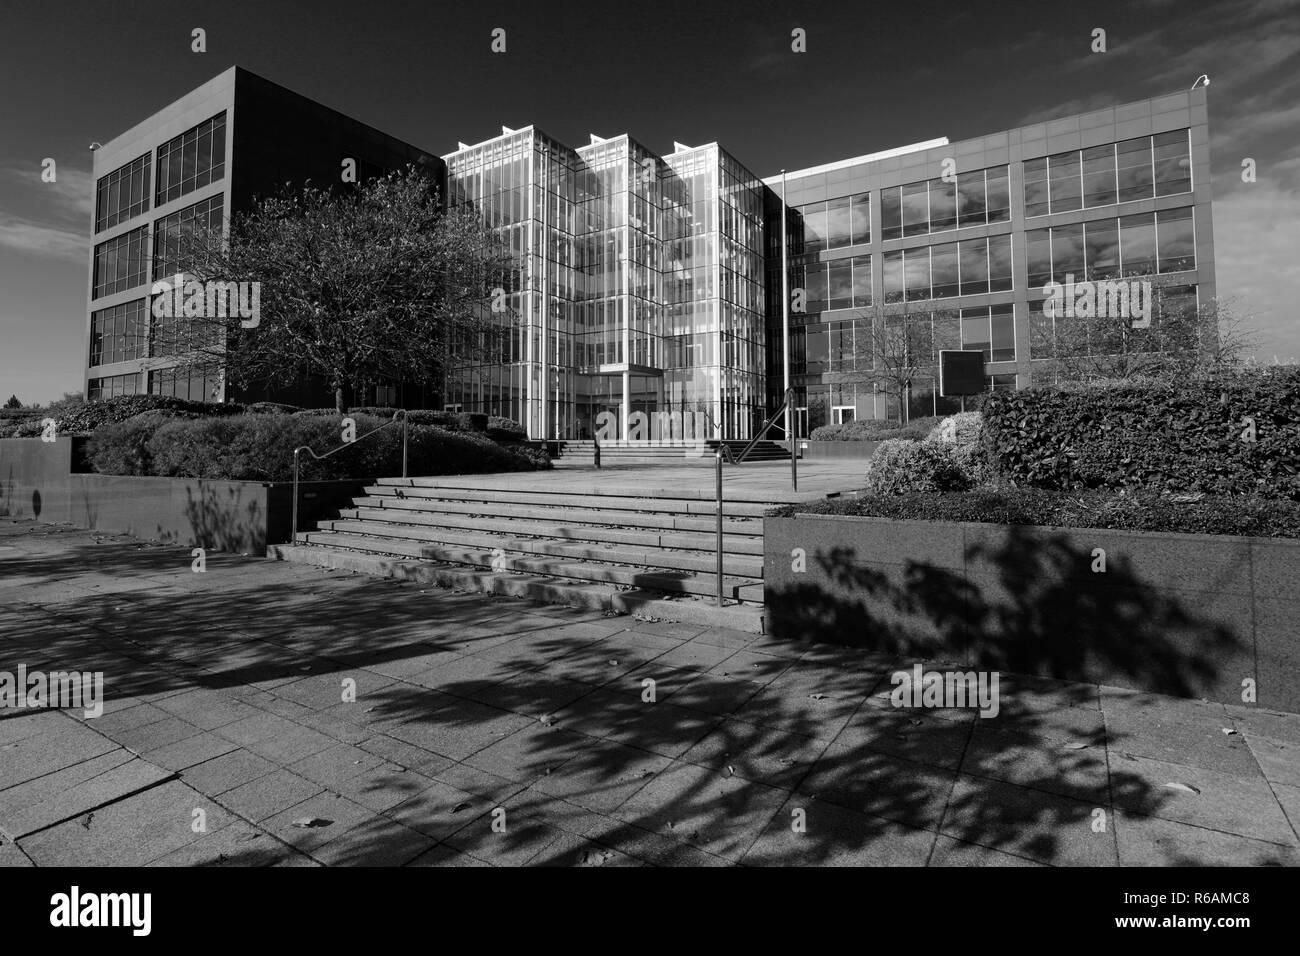 Witan Gate House building, Central Milton Keynes, Buckinghamshire, England; UK - Stock Image